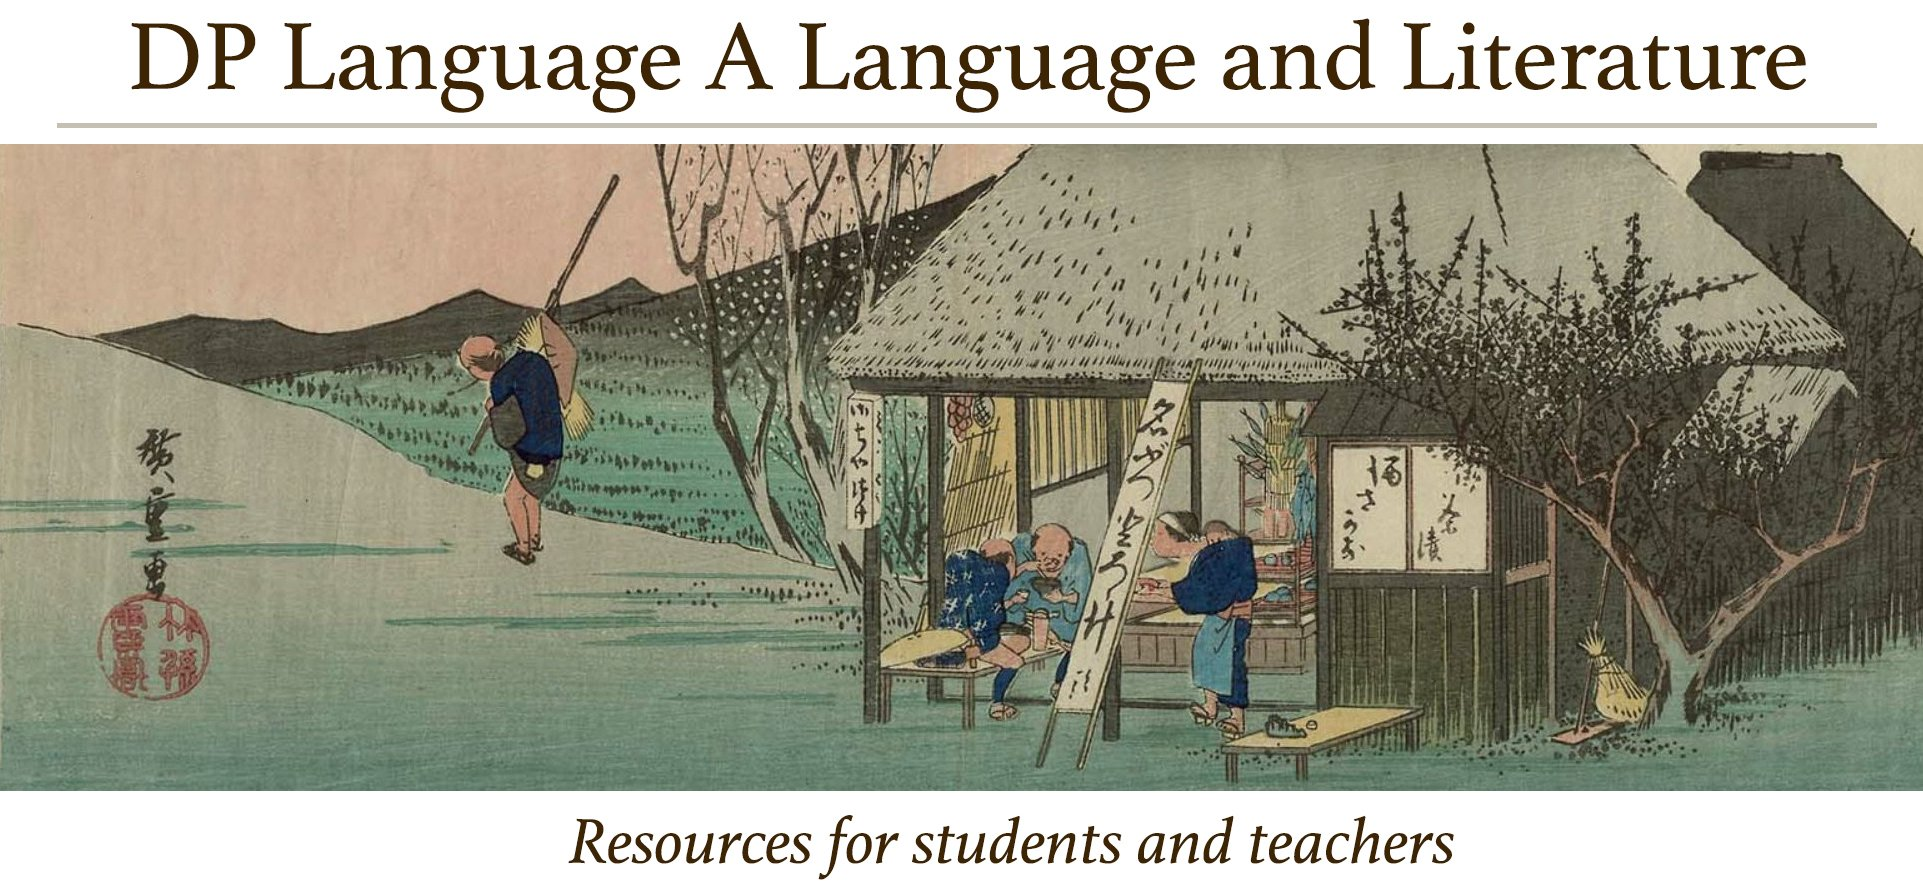 DP Language A Language and Literature